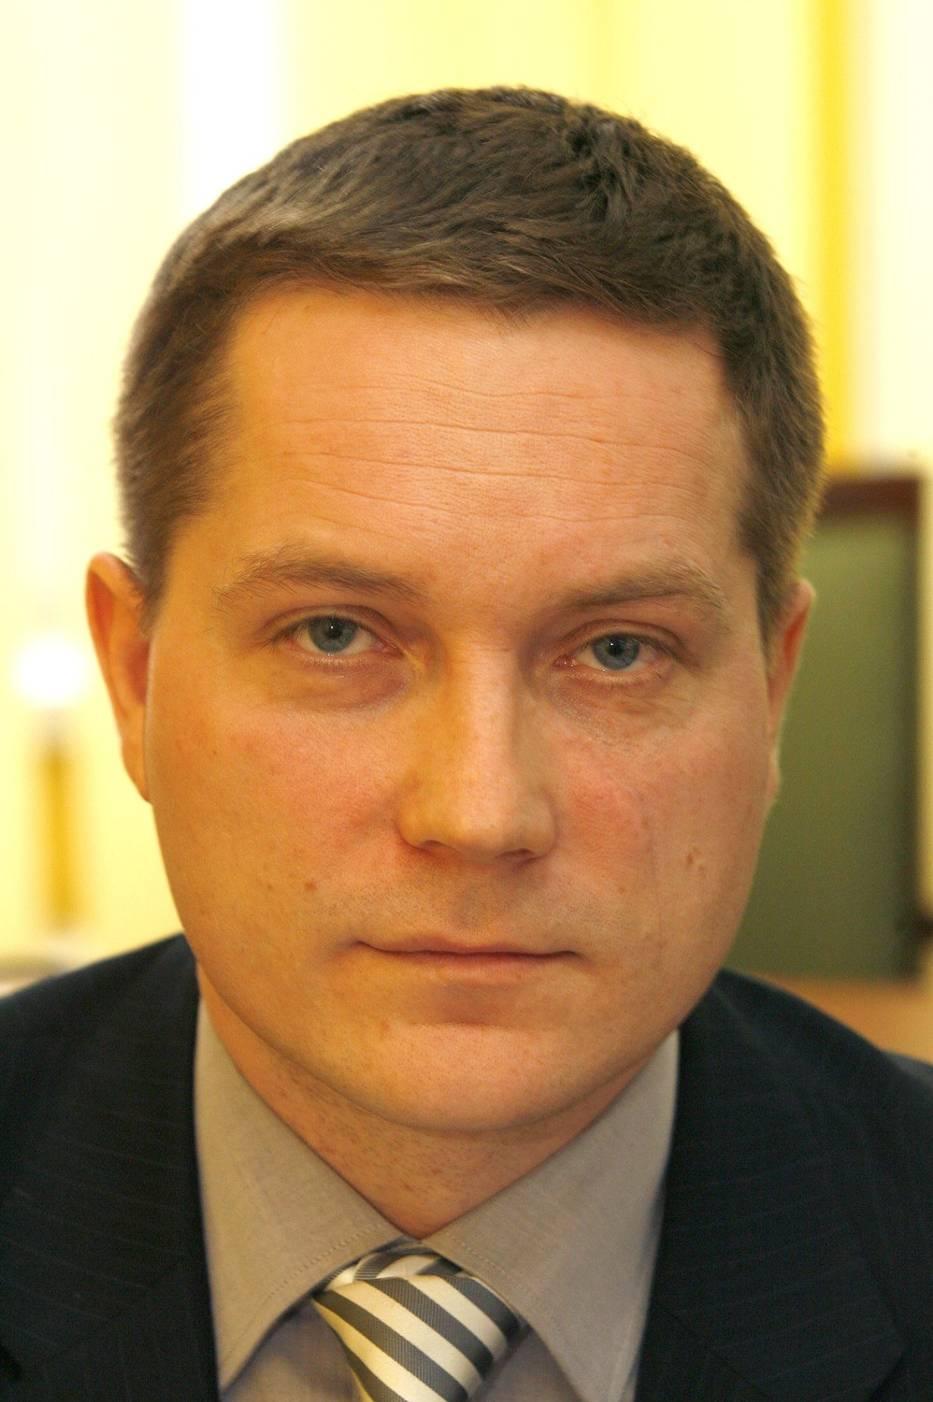 Szymon Heretyk